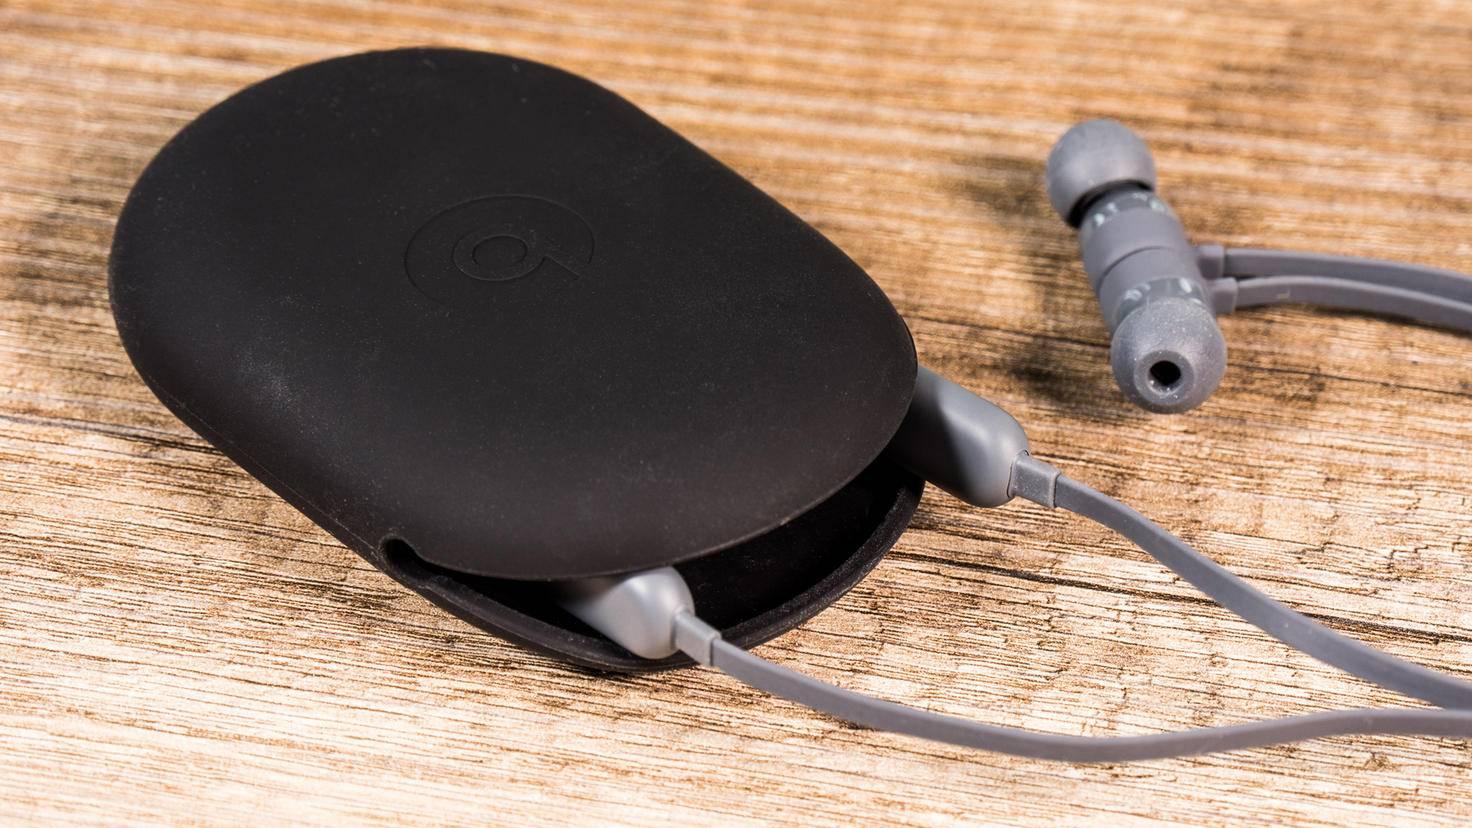 Das Kabel des Beats X ist stabil, aber trotzdem faltbar.